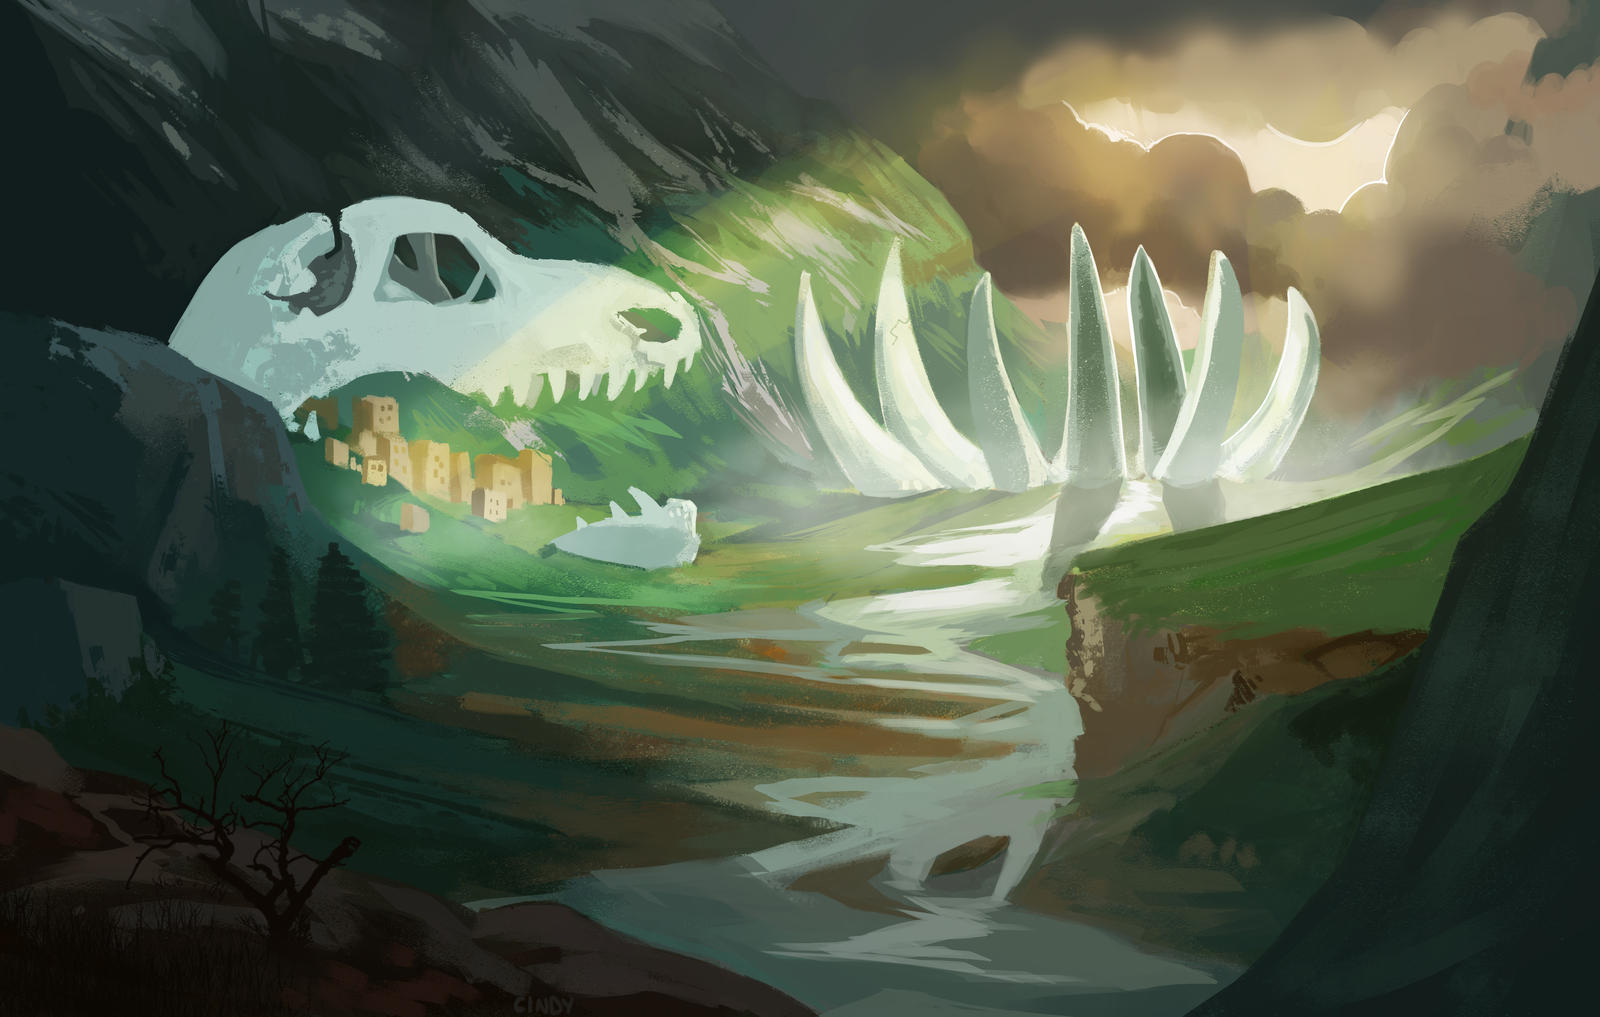 The Remains by MugiwaraWolf